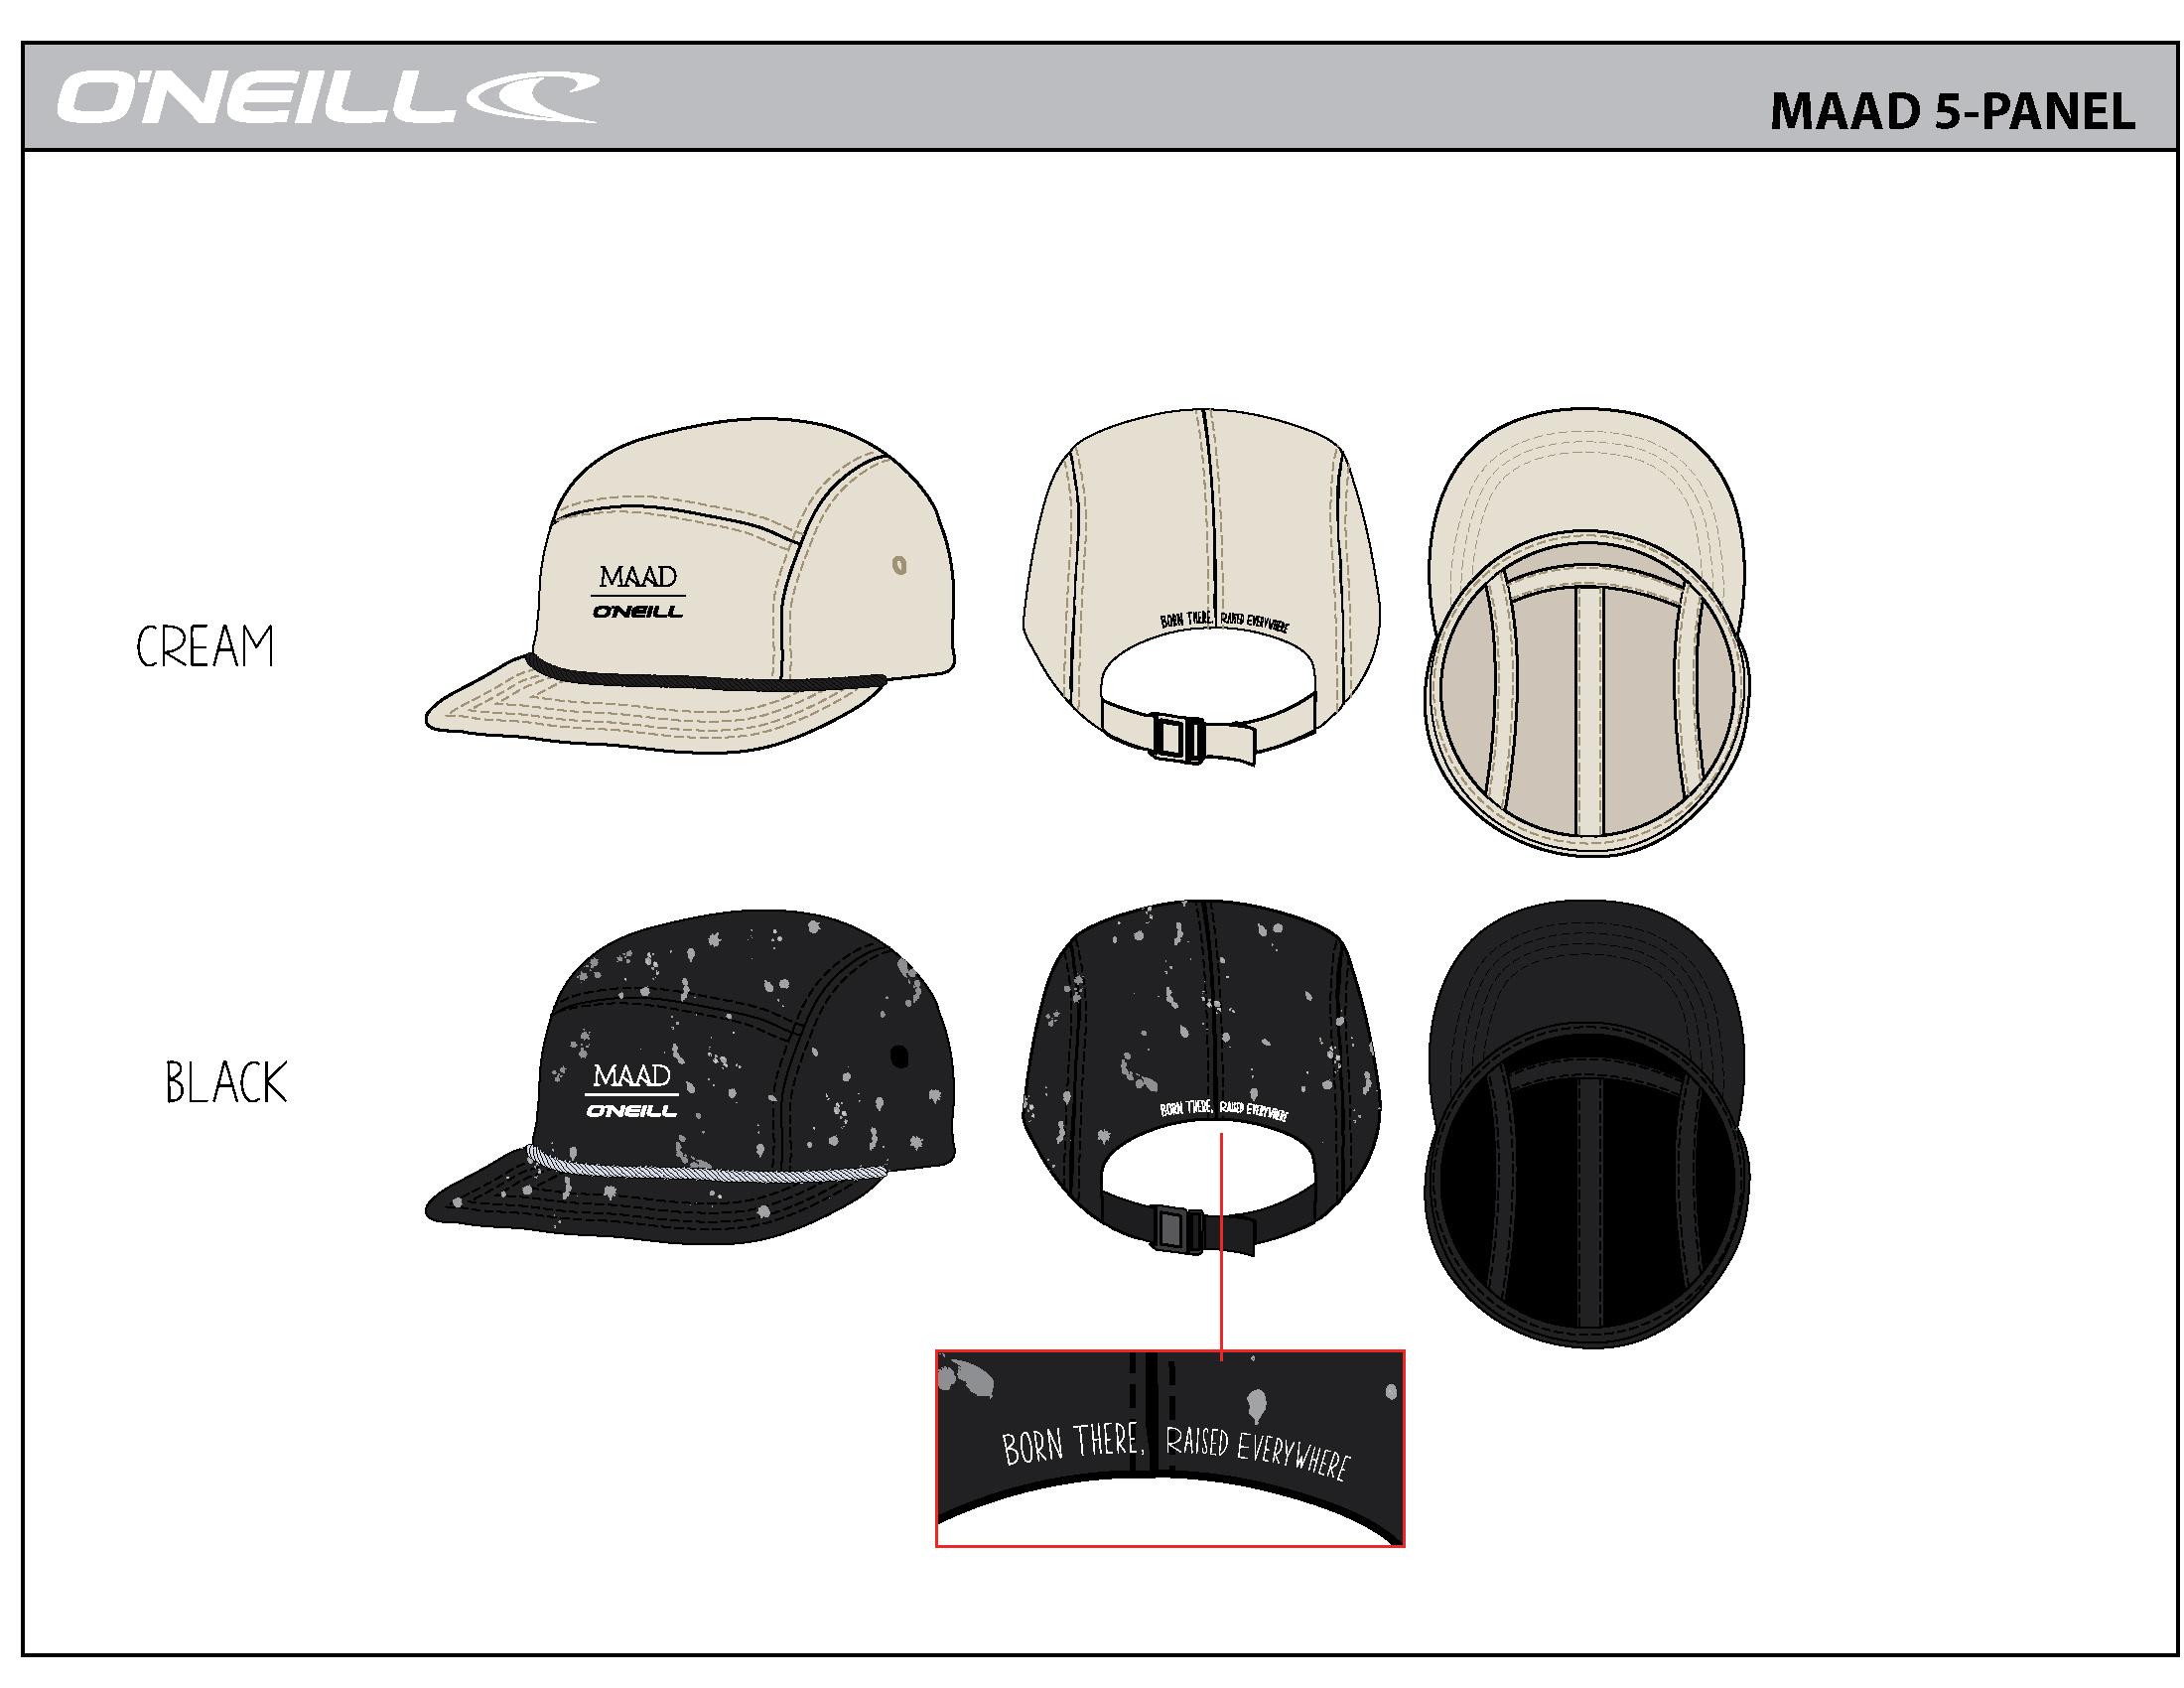 MAADxONEILL-2016-17_11-6-15-03.jpg